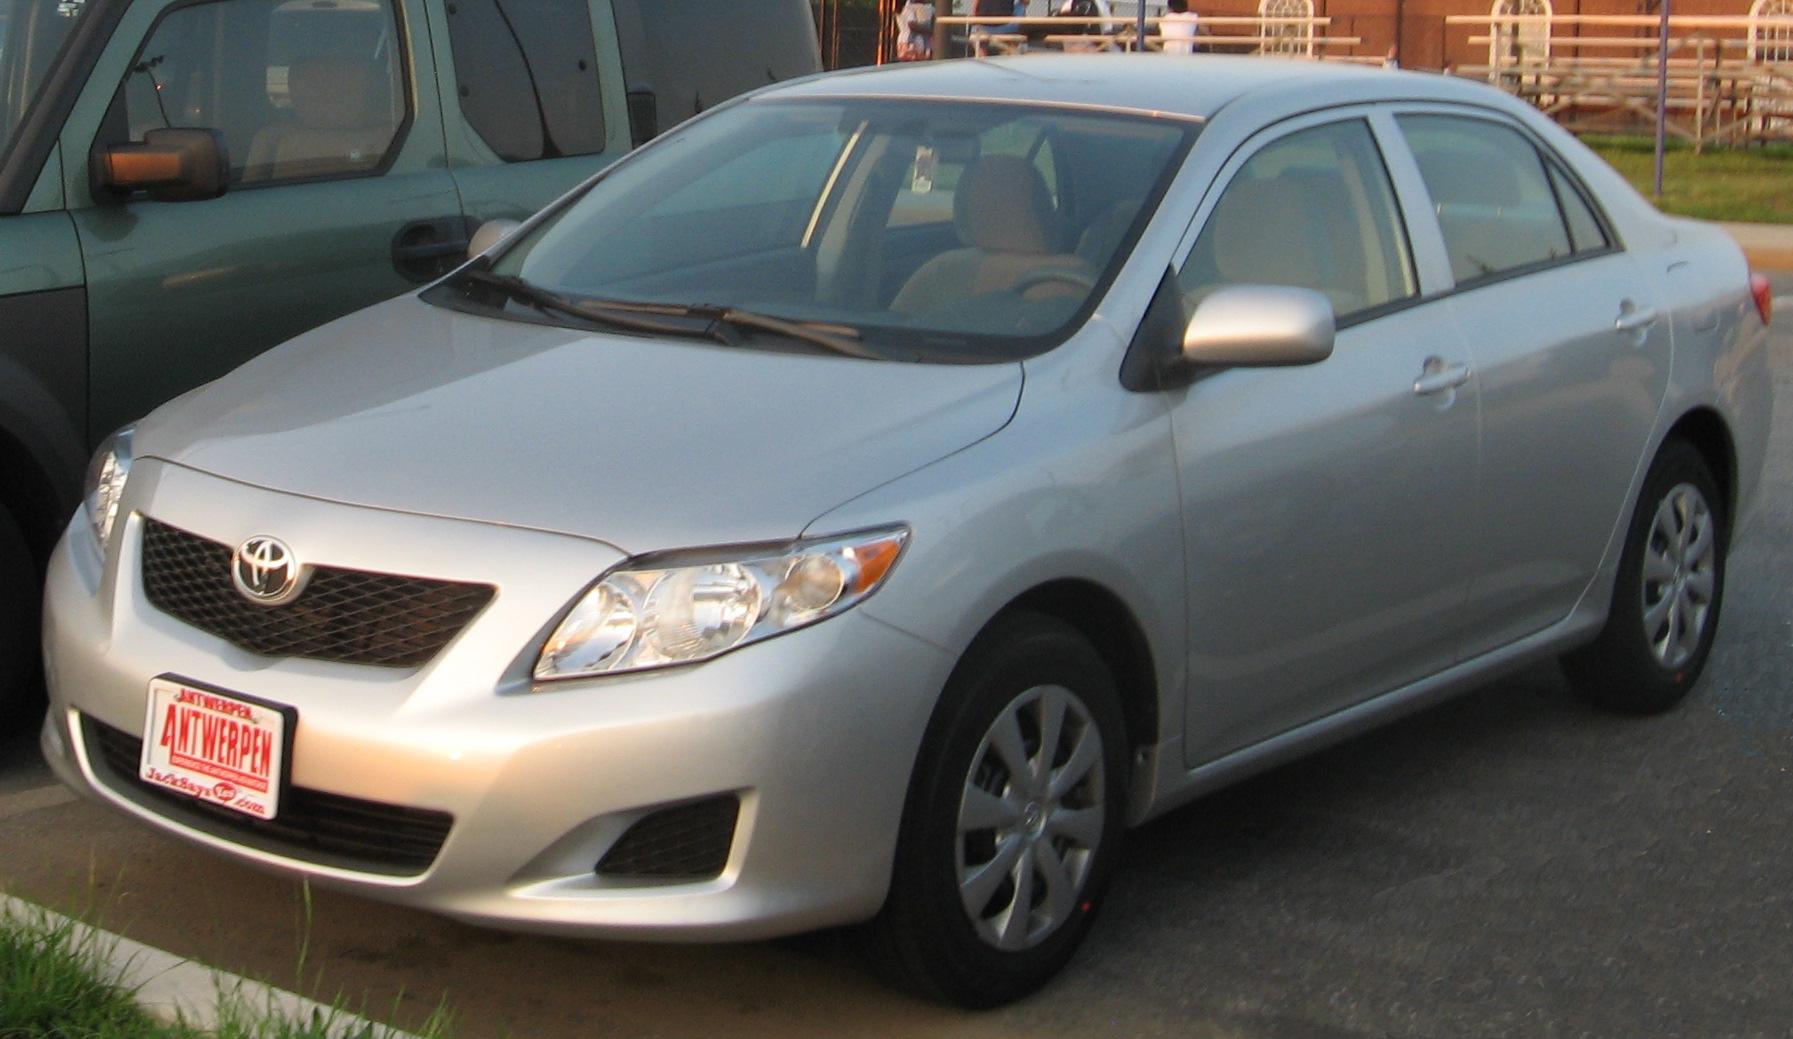 Toyota Corolla Size >> File:2009 Toyota Corolla LE.jpg - Wikimedia Commons